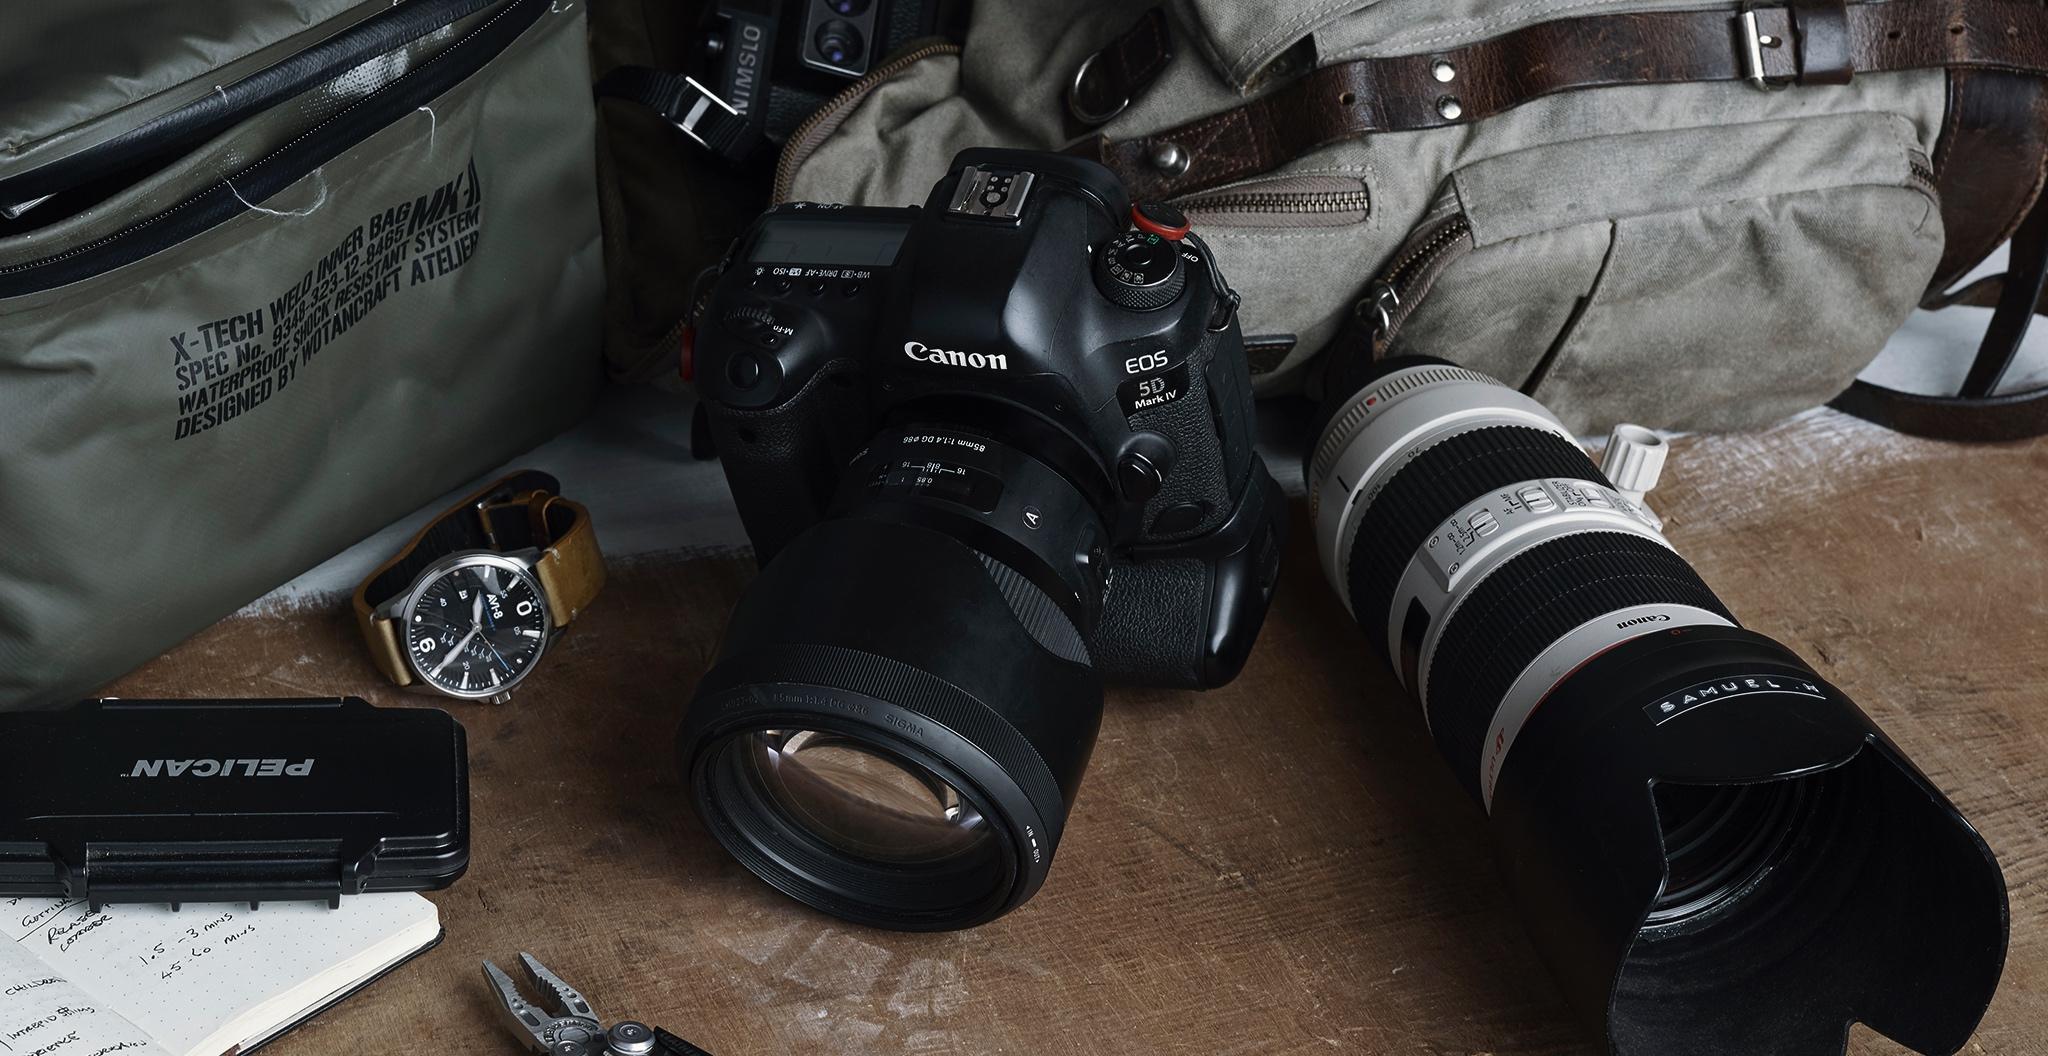 Samuel-hesketh-photography-TG 2.jpg